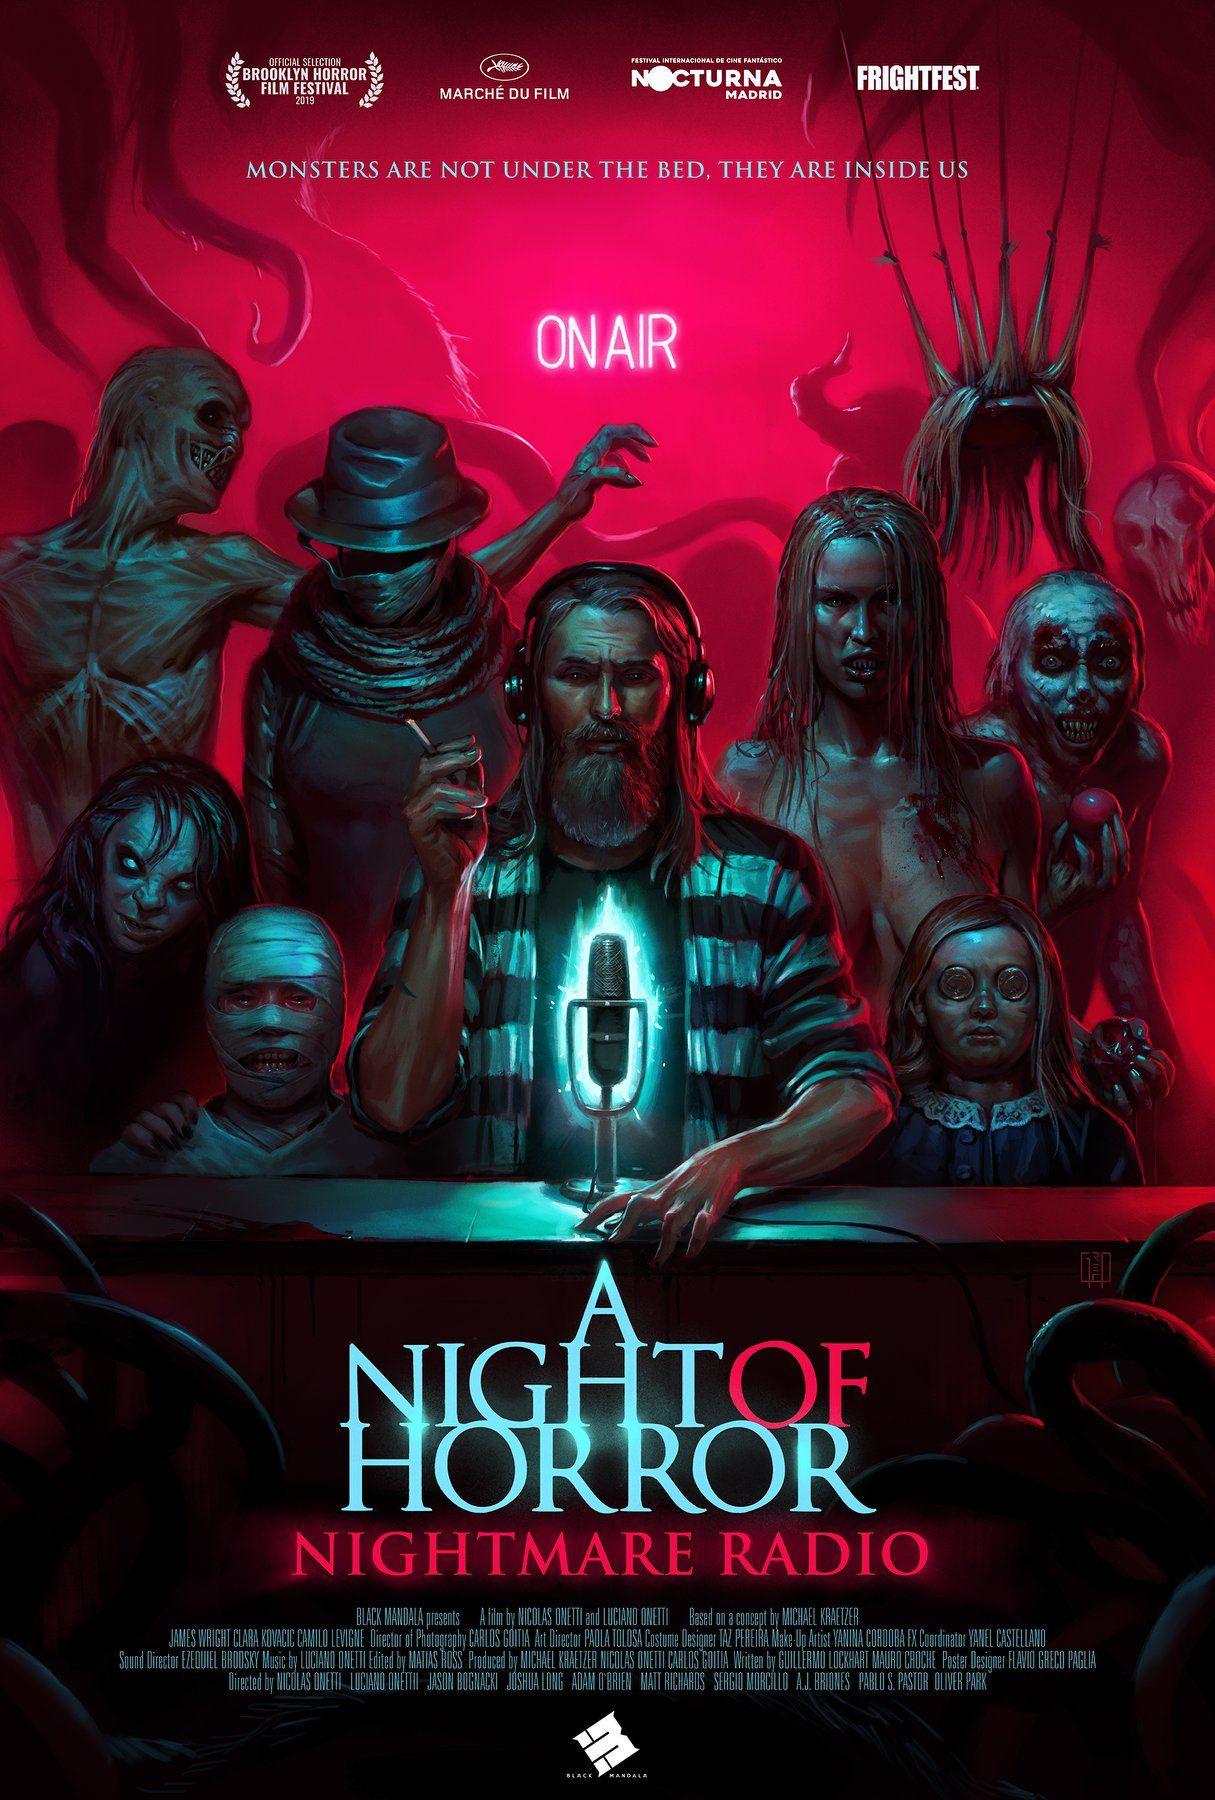 Eloscurorincondelterror Horrormovies A Night Of Horror Nightmare